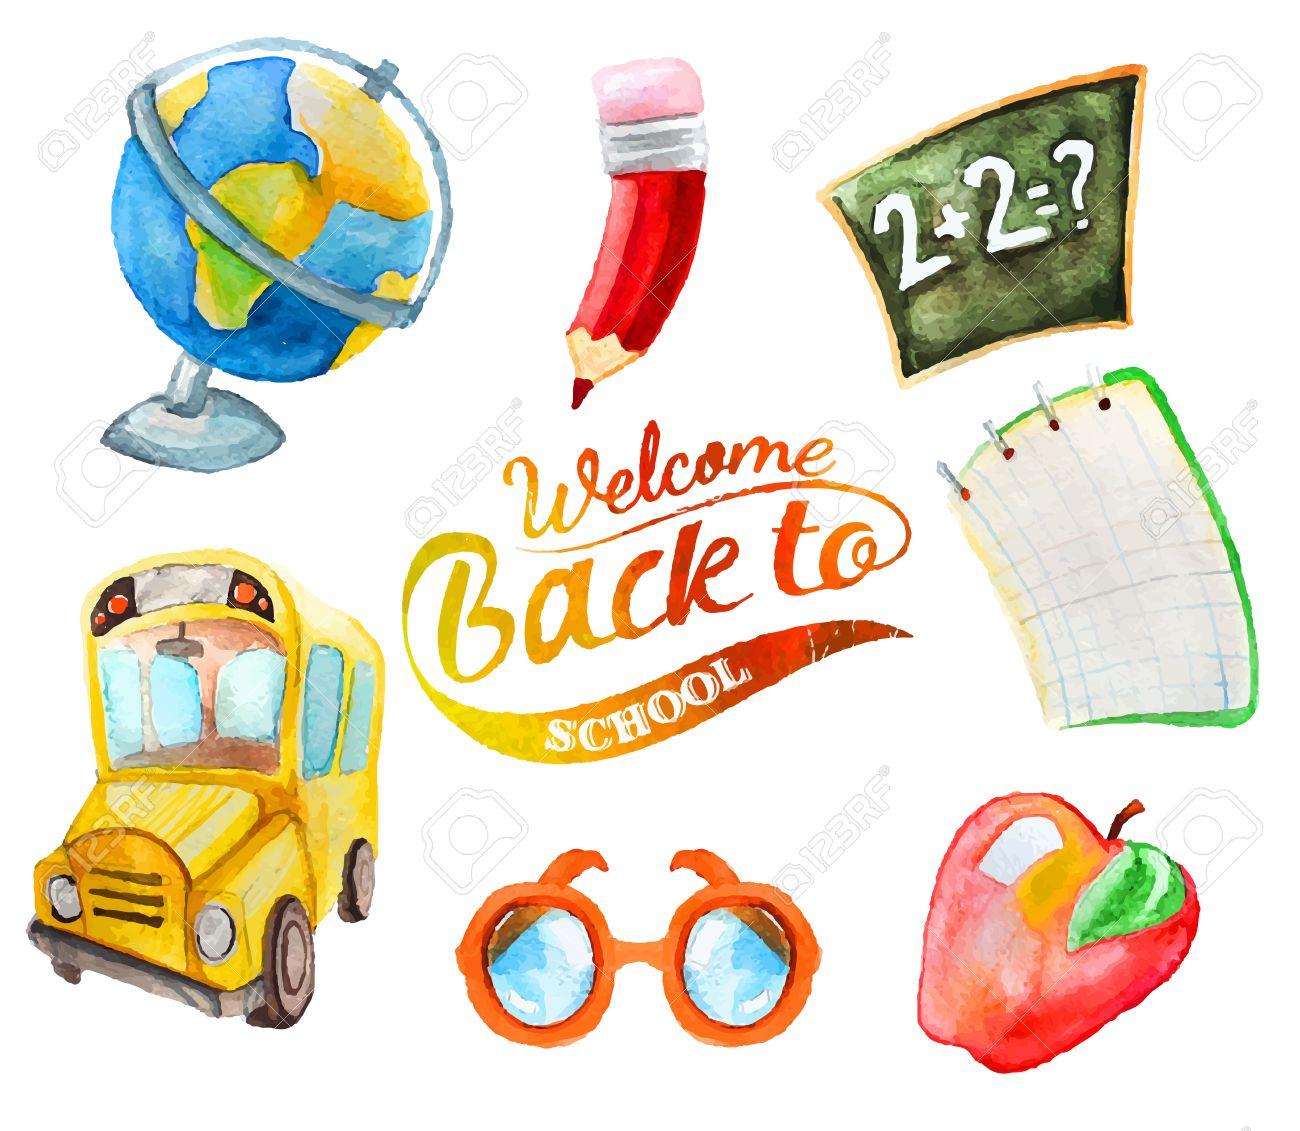 Watercolor hand drawn set of school items. Welcome back to school. Globe, school bus, apple, glasses, pencil, notebook, school board, blackboard, math. - 42848911